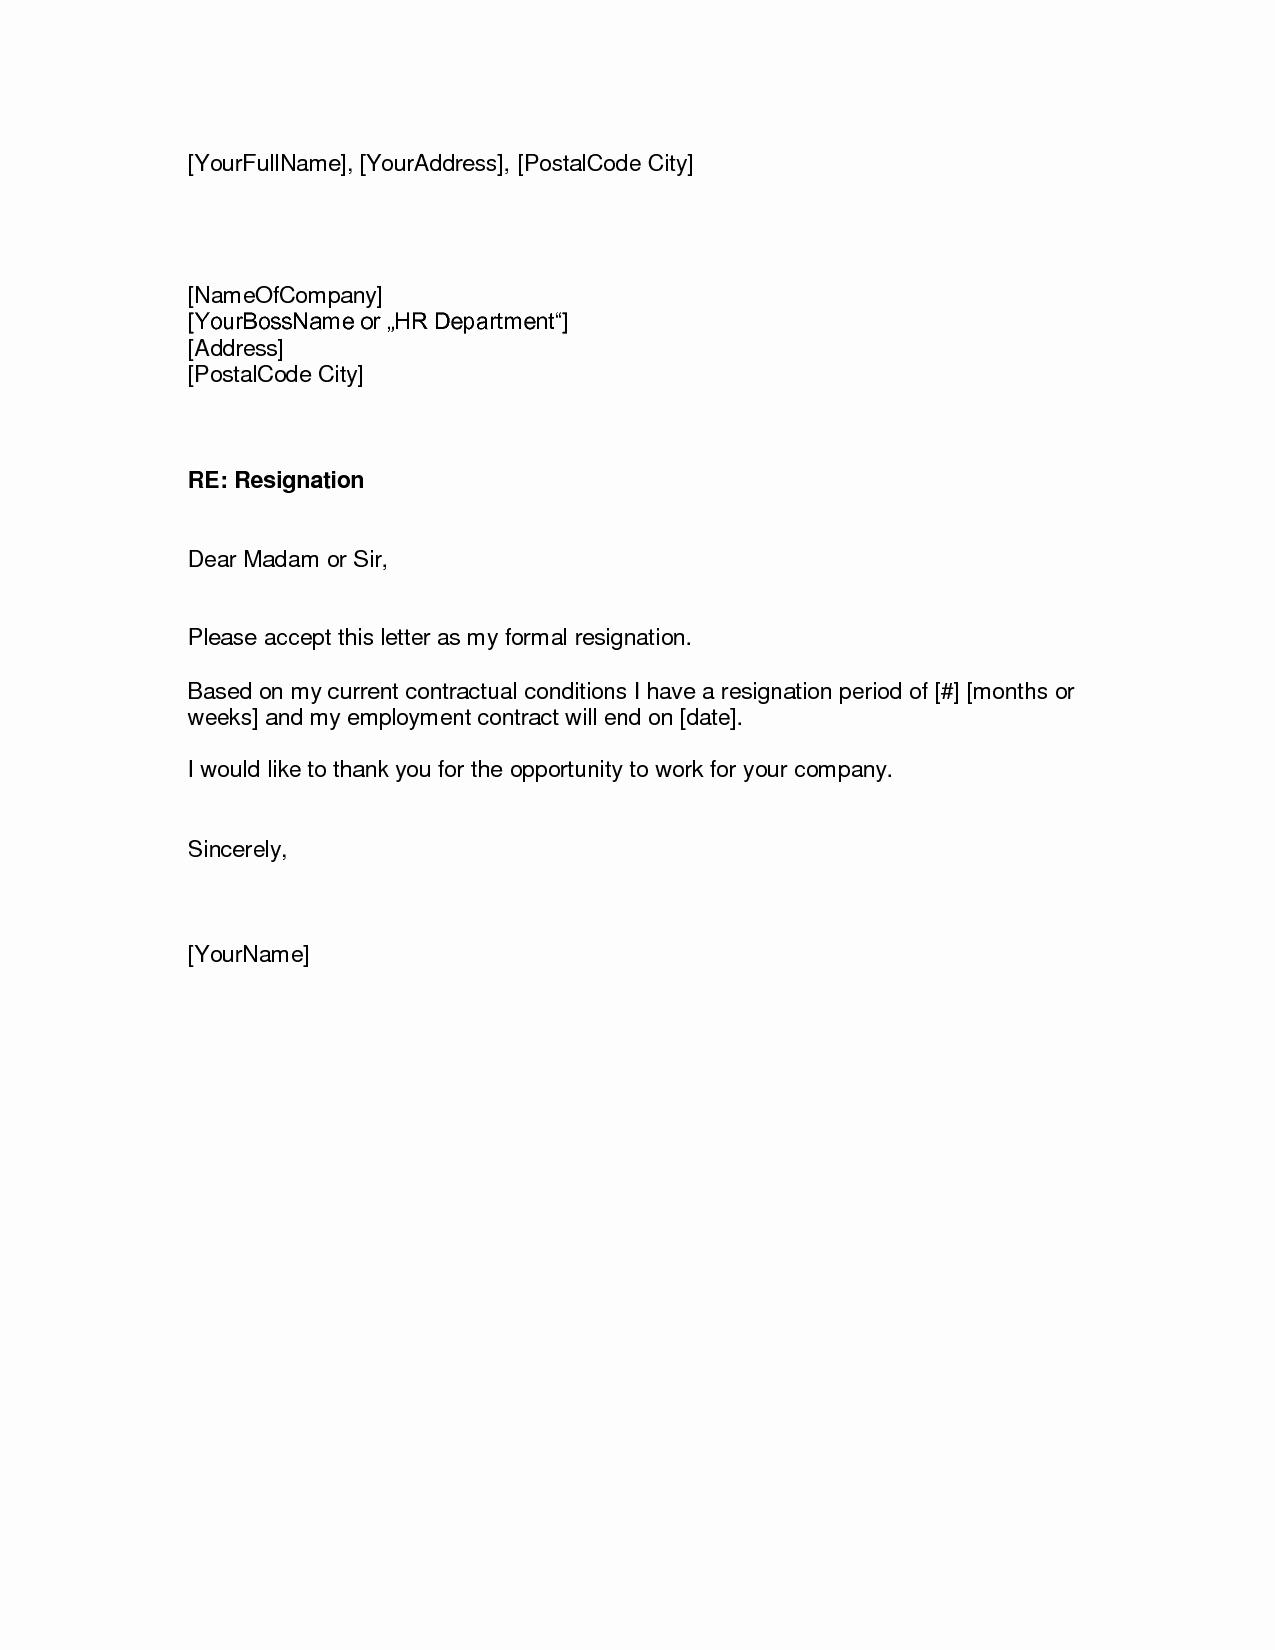 Letter Of Resignation Template Download Unique Download Resignation Letters Pdf & Doc